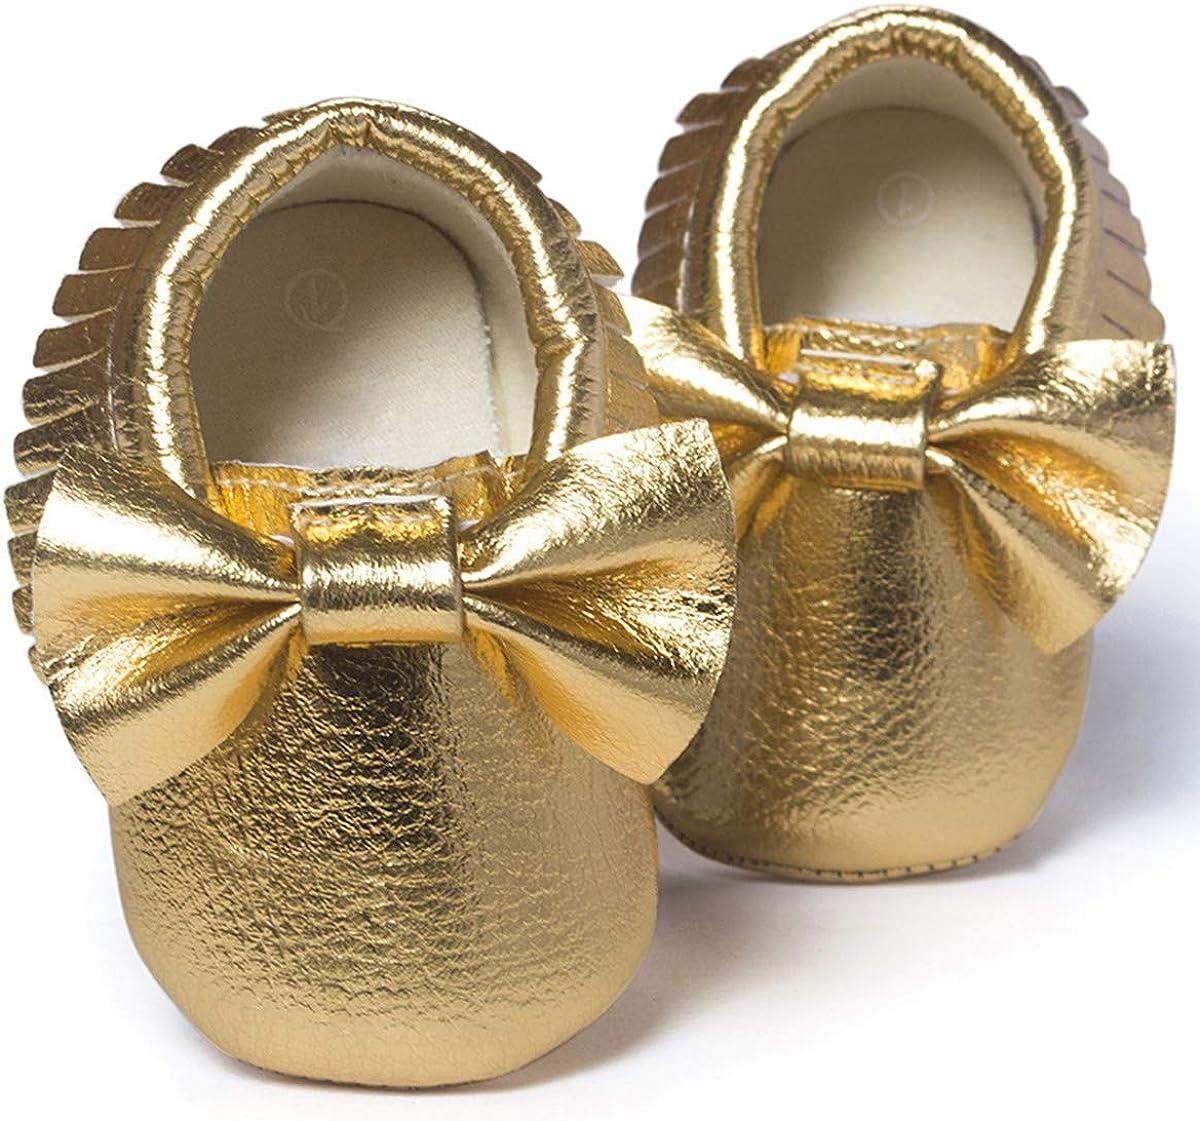 BENHERO Newborn Baby Boys Girls Soft Soled Tassel Bowknots Crib Infant Toddler Prewalker Moccasins Shoes